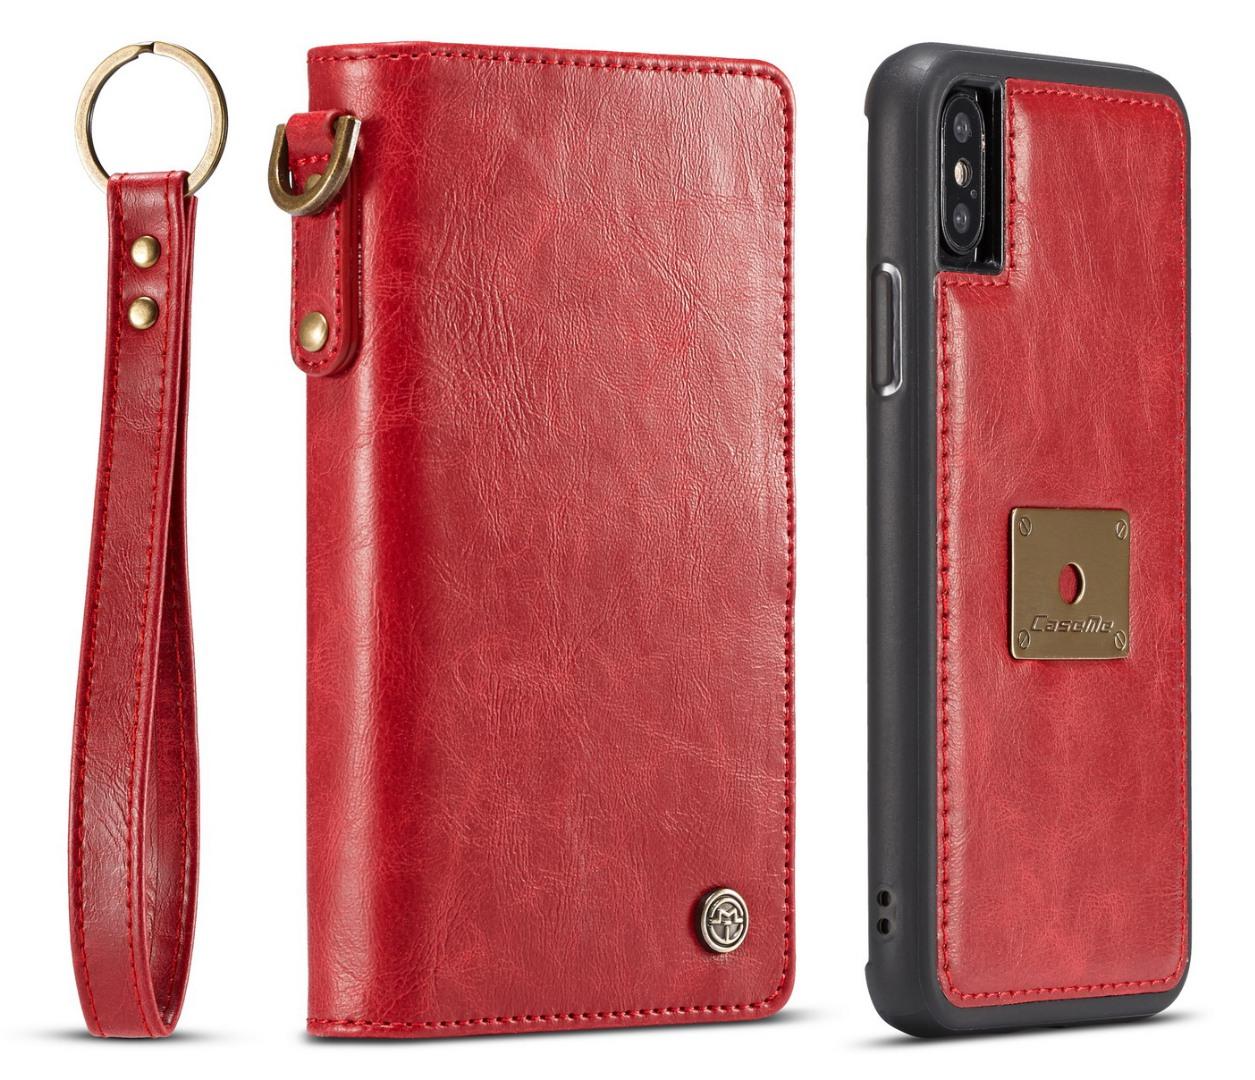 Husa piele portofel, multifunctionala, buzunare carduri, bani, casti, chei, iPhone X / XS - CaseMe, Rosu